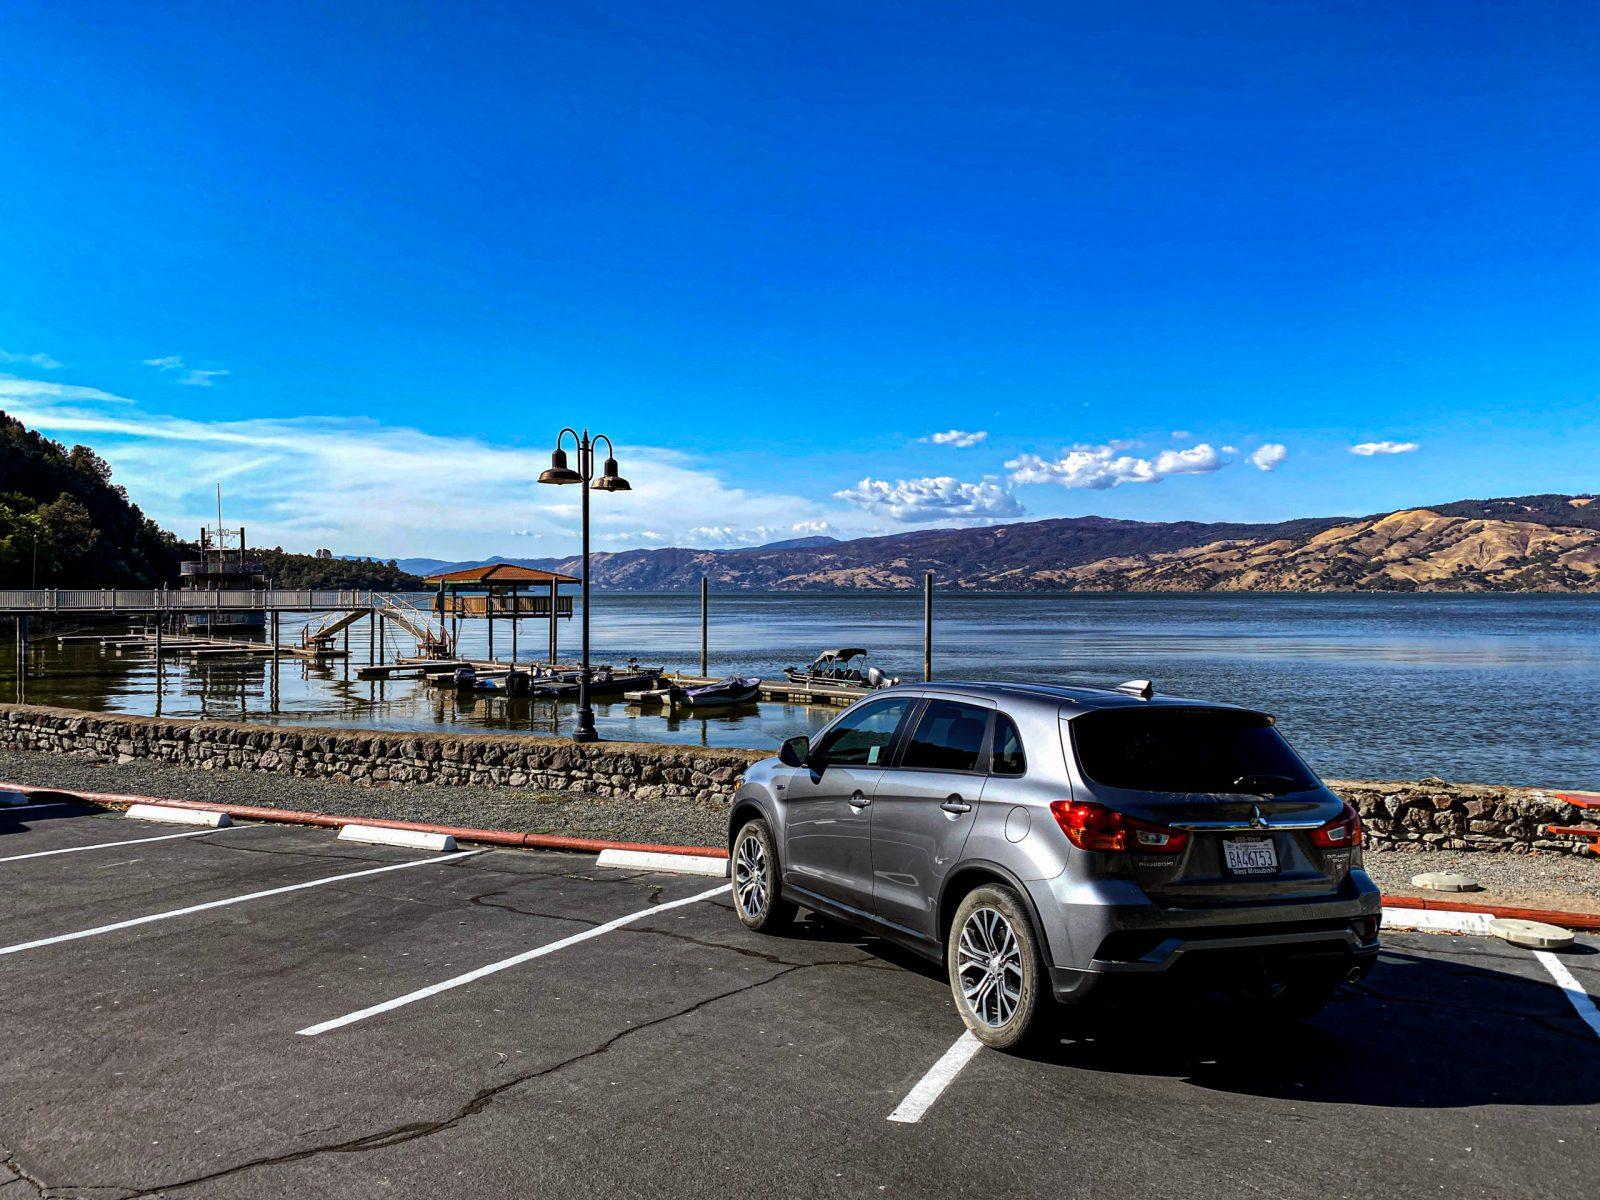 2019 Mitsubishi Outlander Sport SE 4WD - Soda Bay, California on Clear Lake